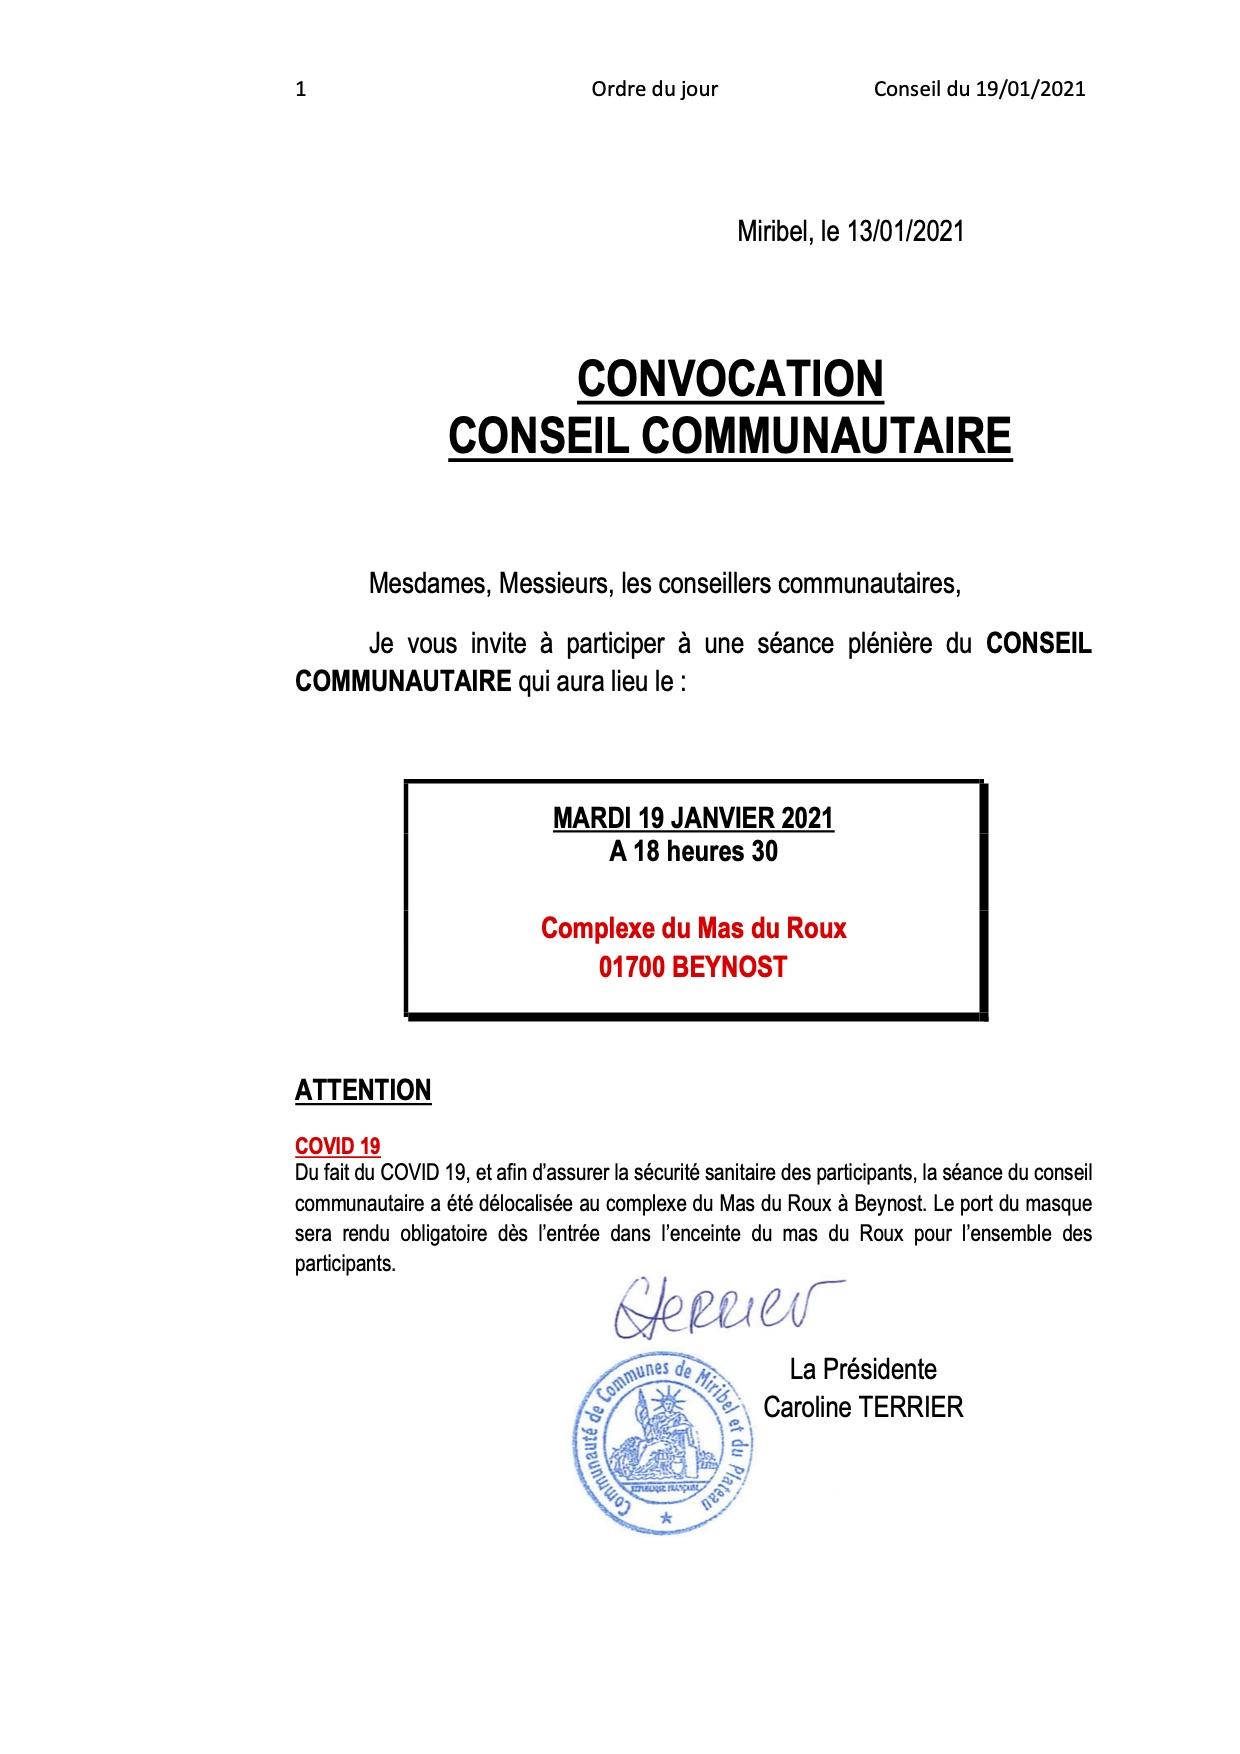 Convocation Conseil Communautaire